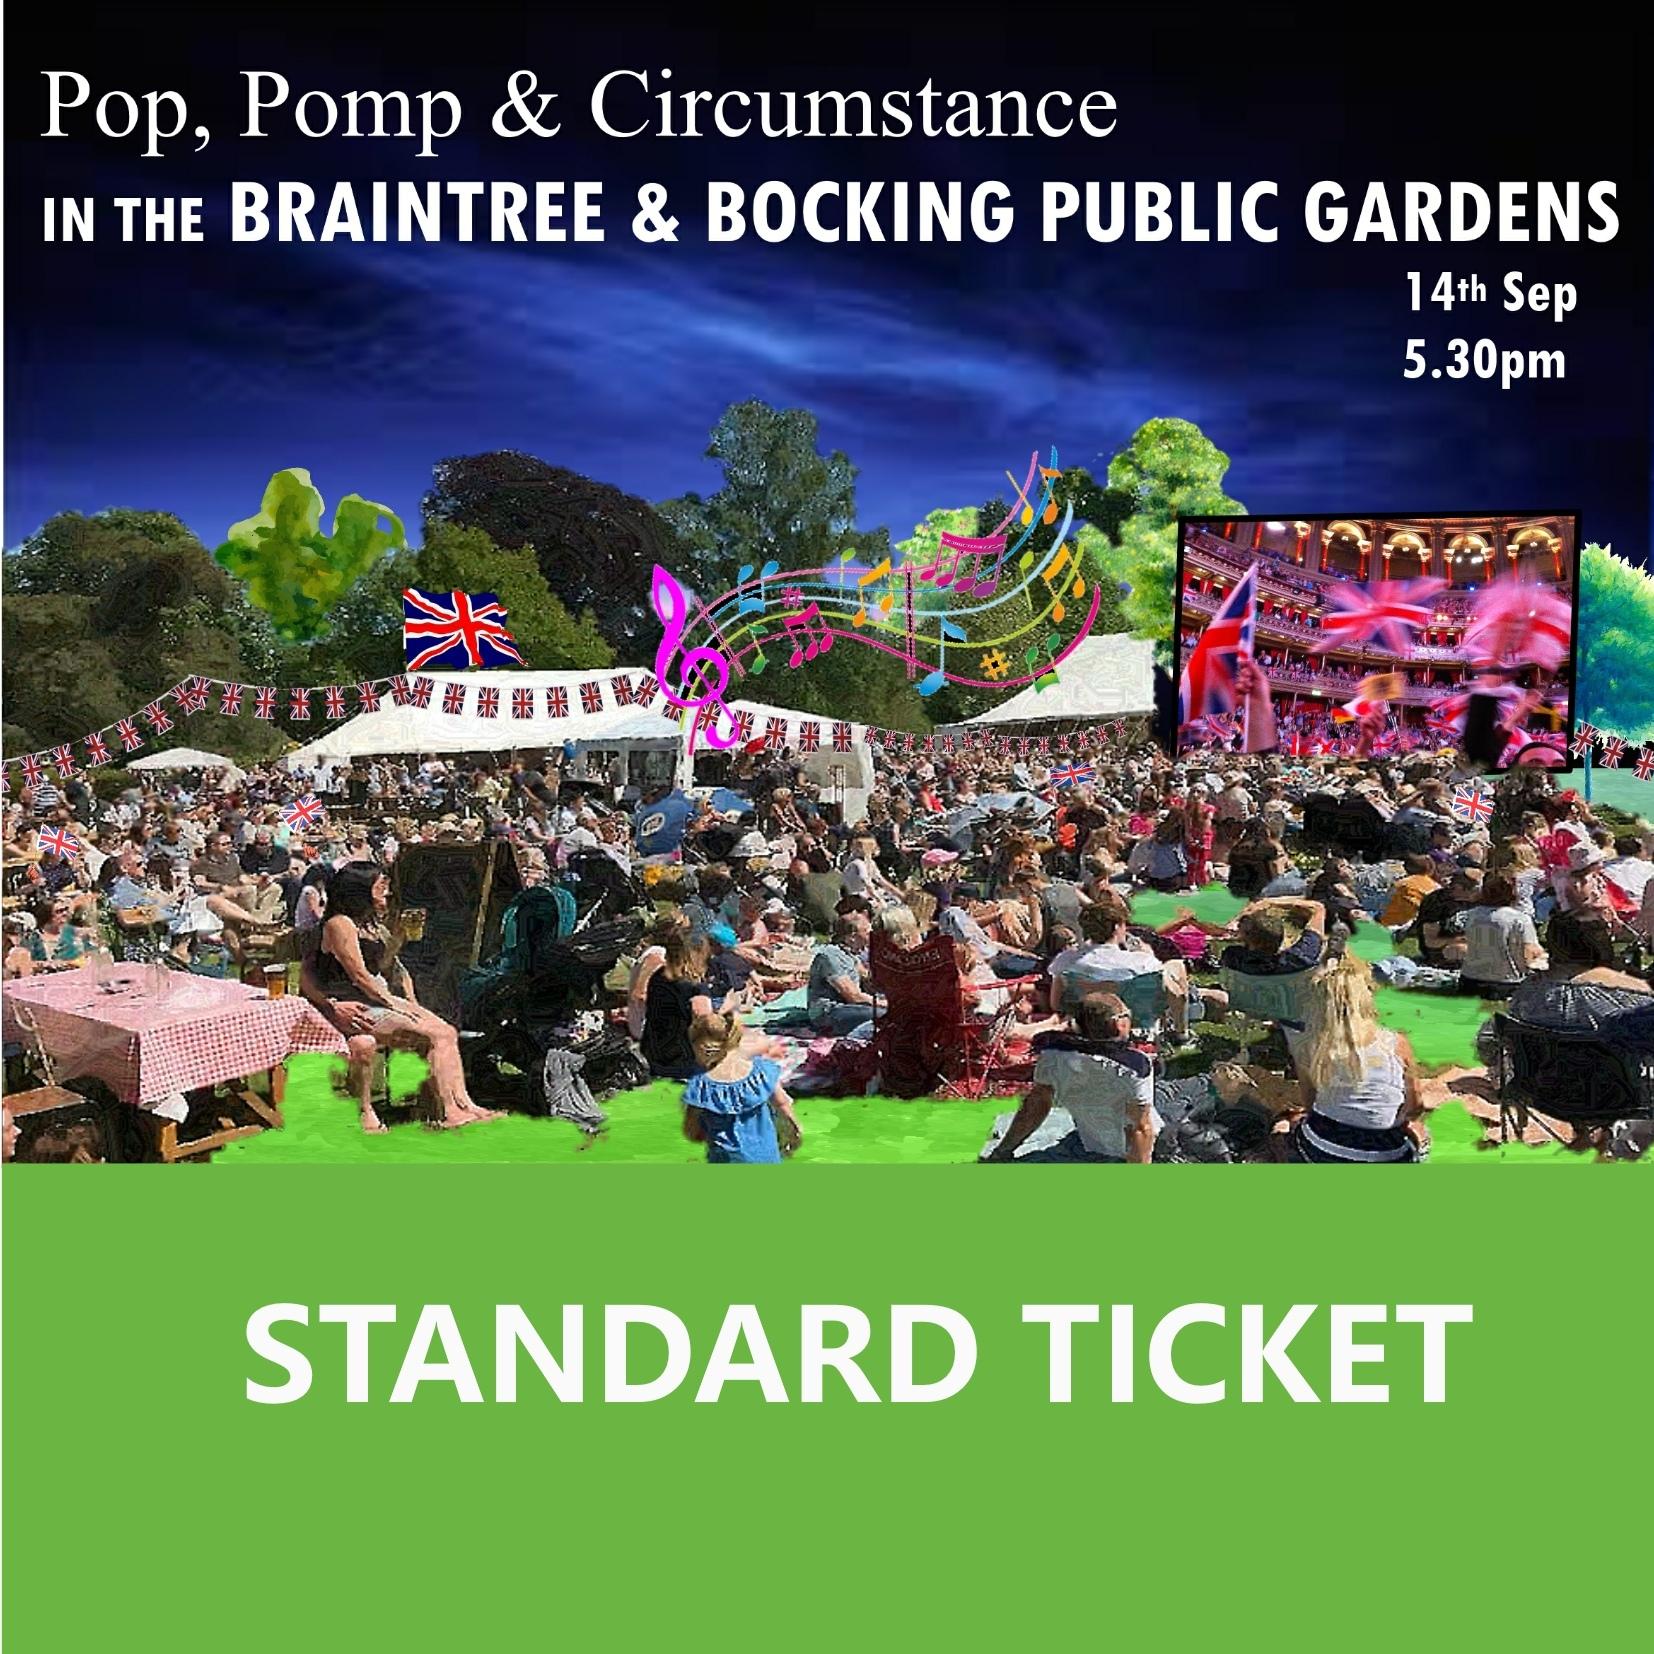 Standard Ticket for Pop, Pomp & Circumstance 00103